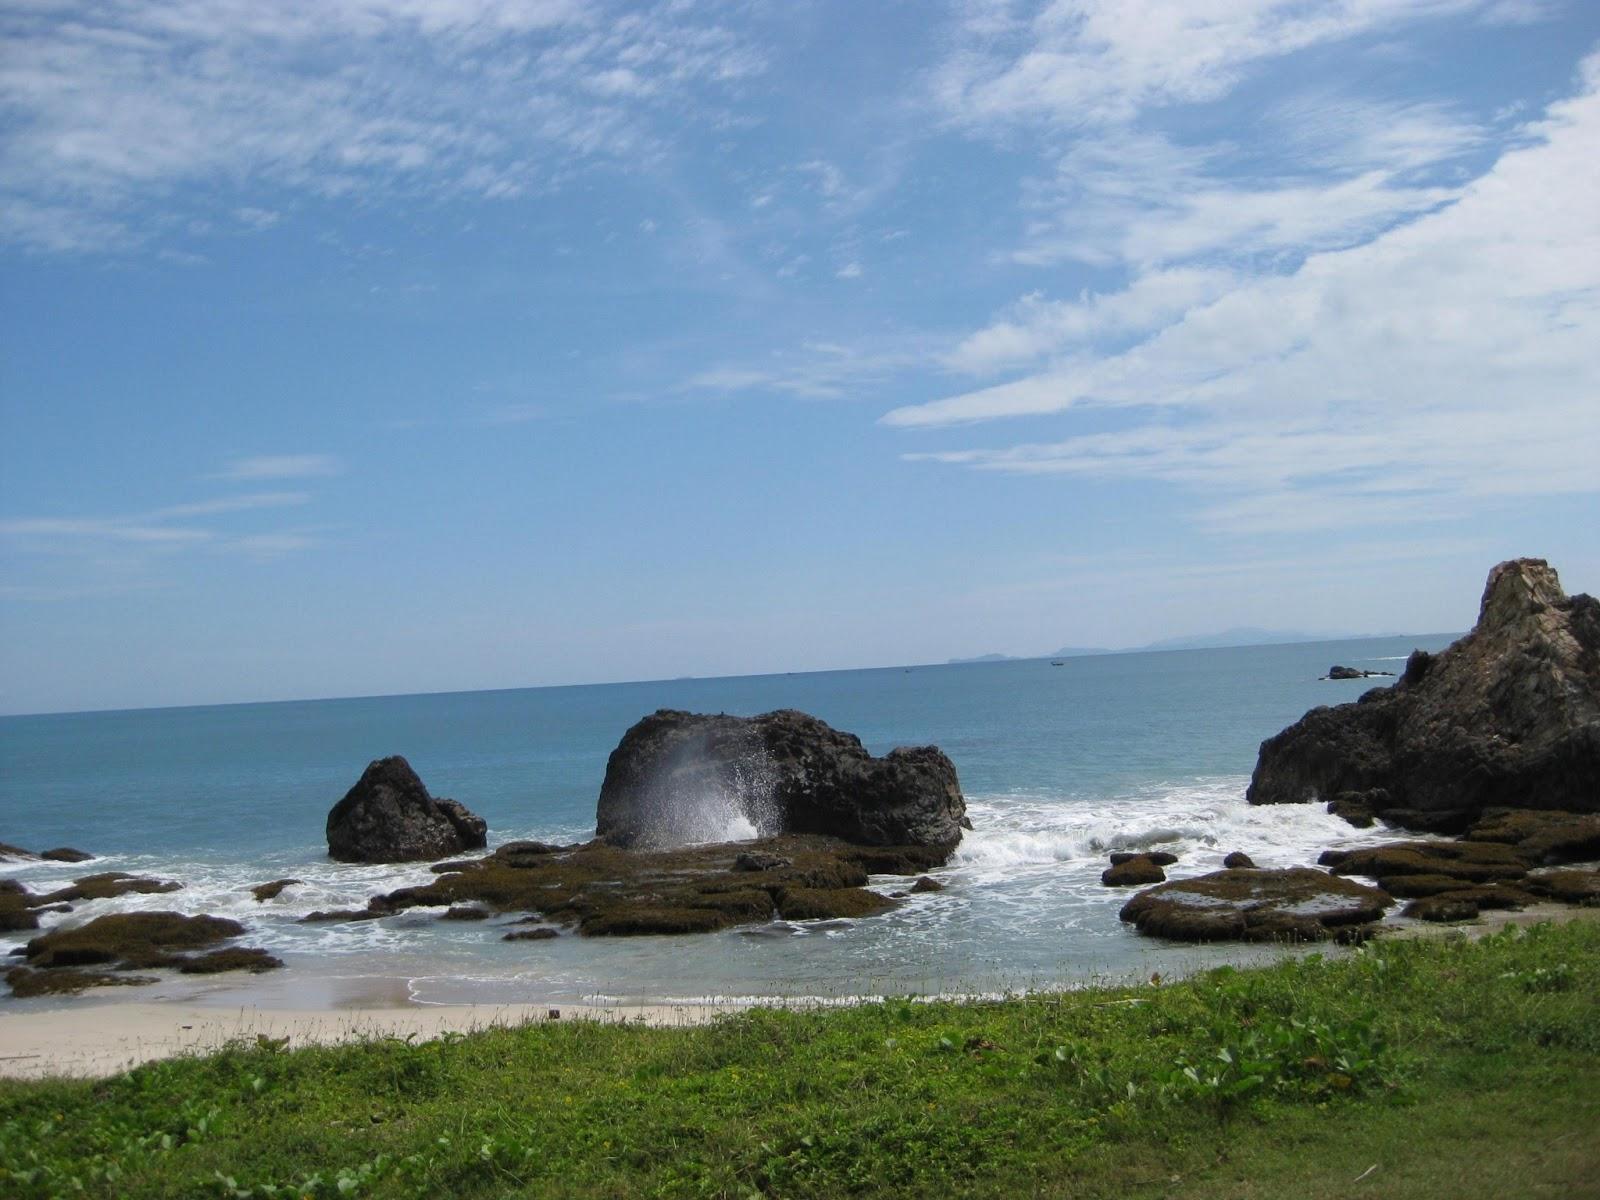 Wisata Pantai Marina di Semarang  Pariwisata Indonesia